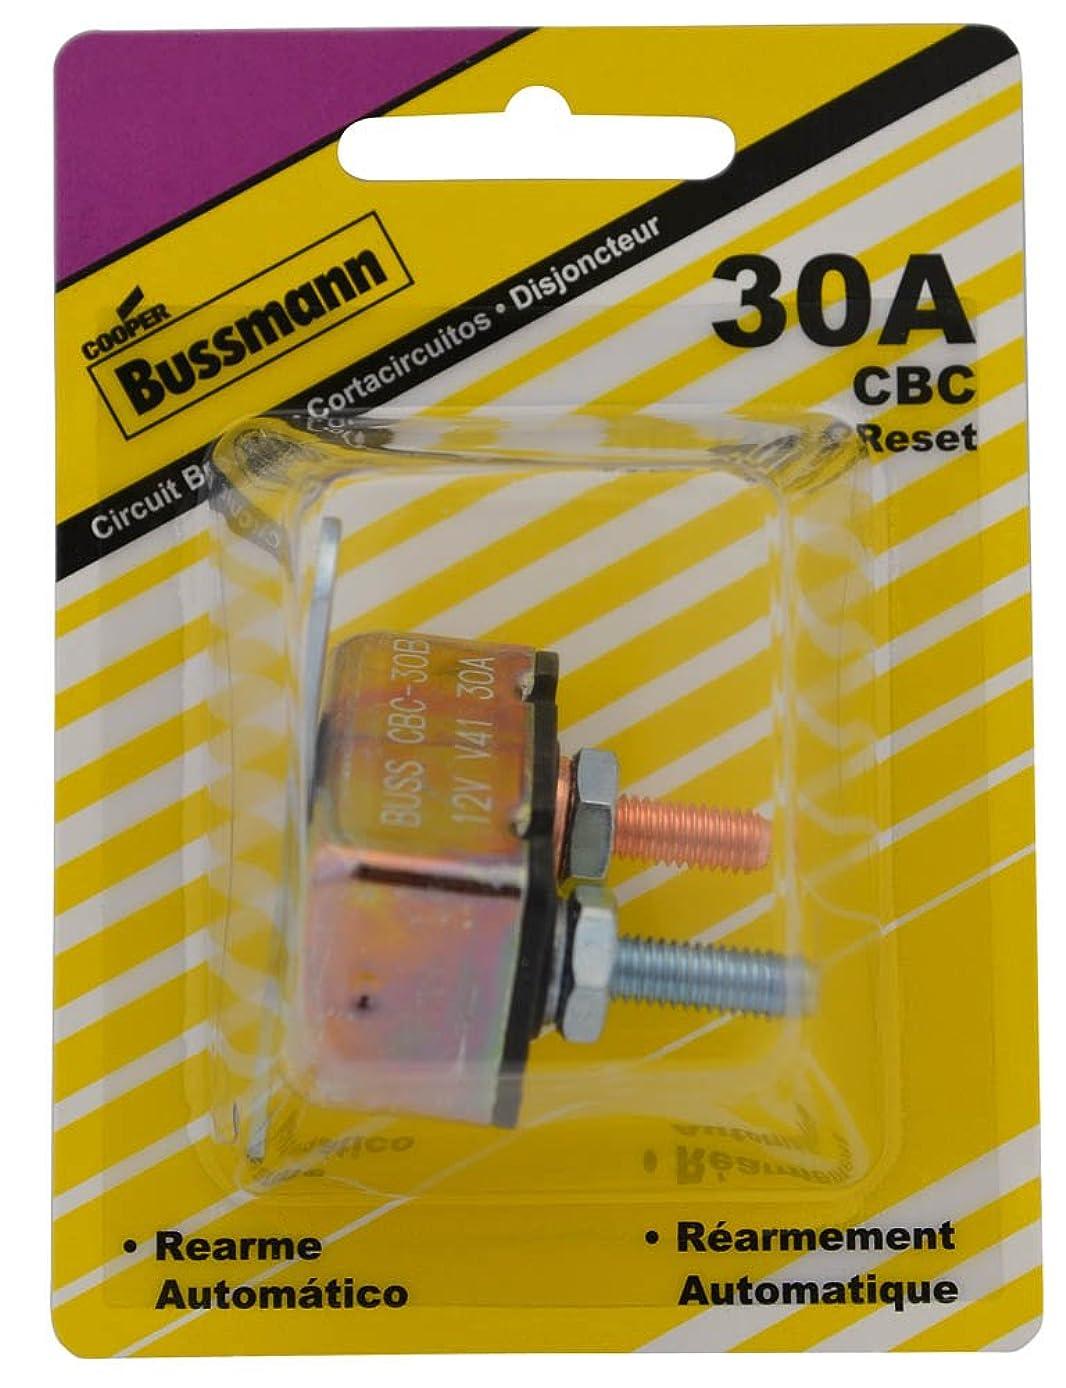 Bussmann (BP/CBC-30B-RP) 30 Amp Type-I Stud Mount Circuit Breaker with Crosswise Bracket